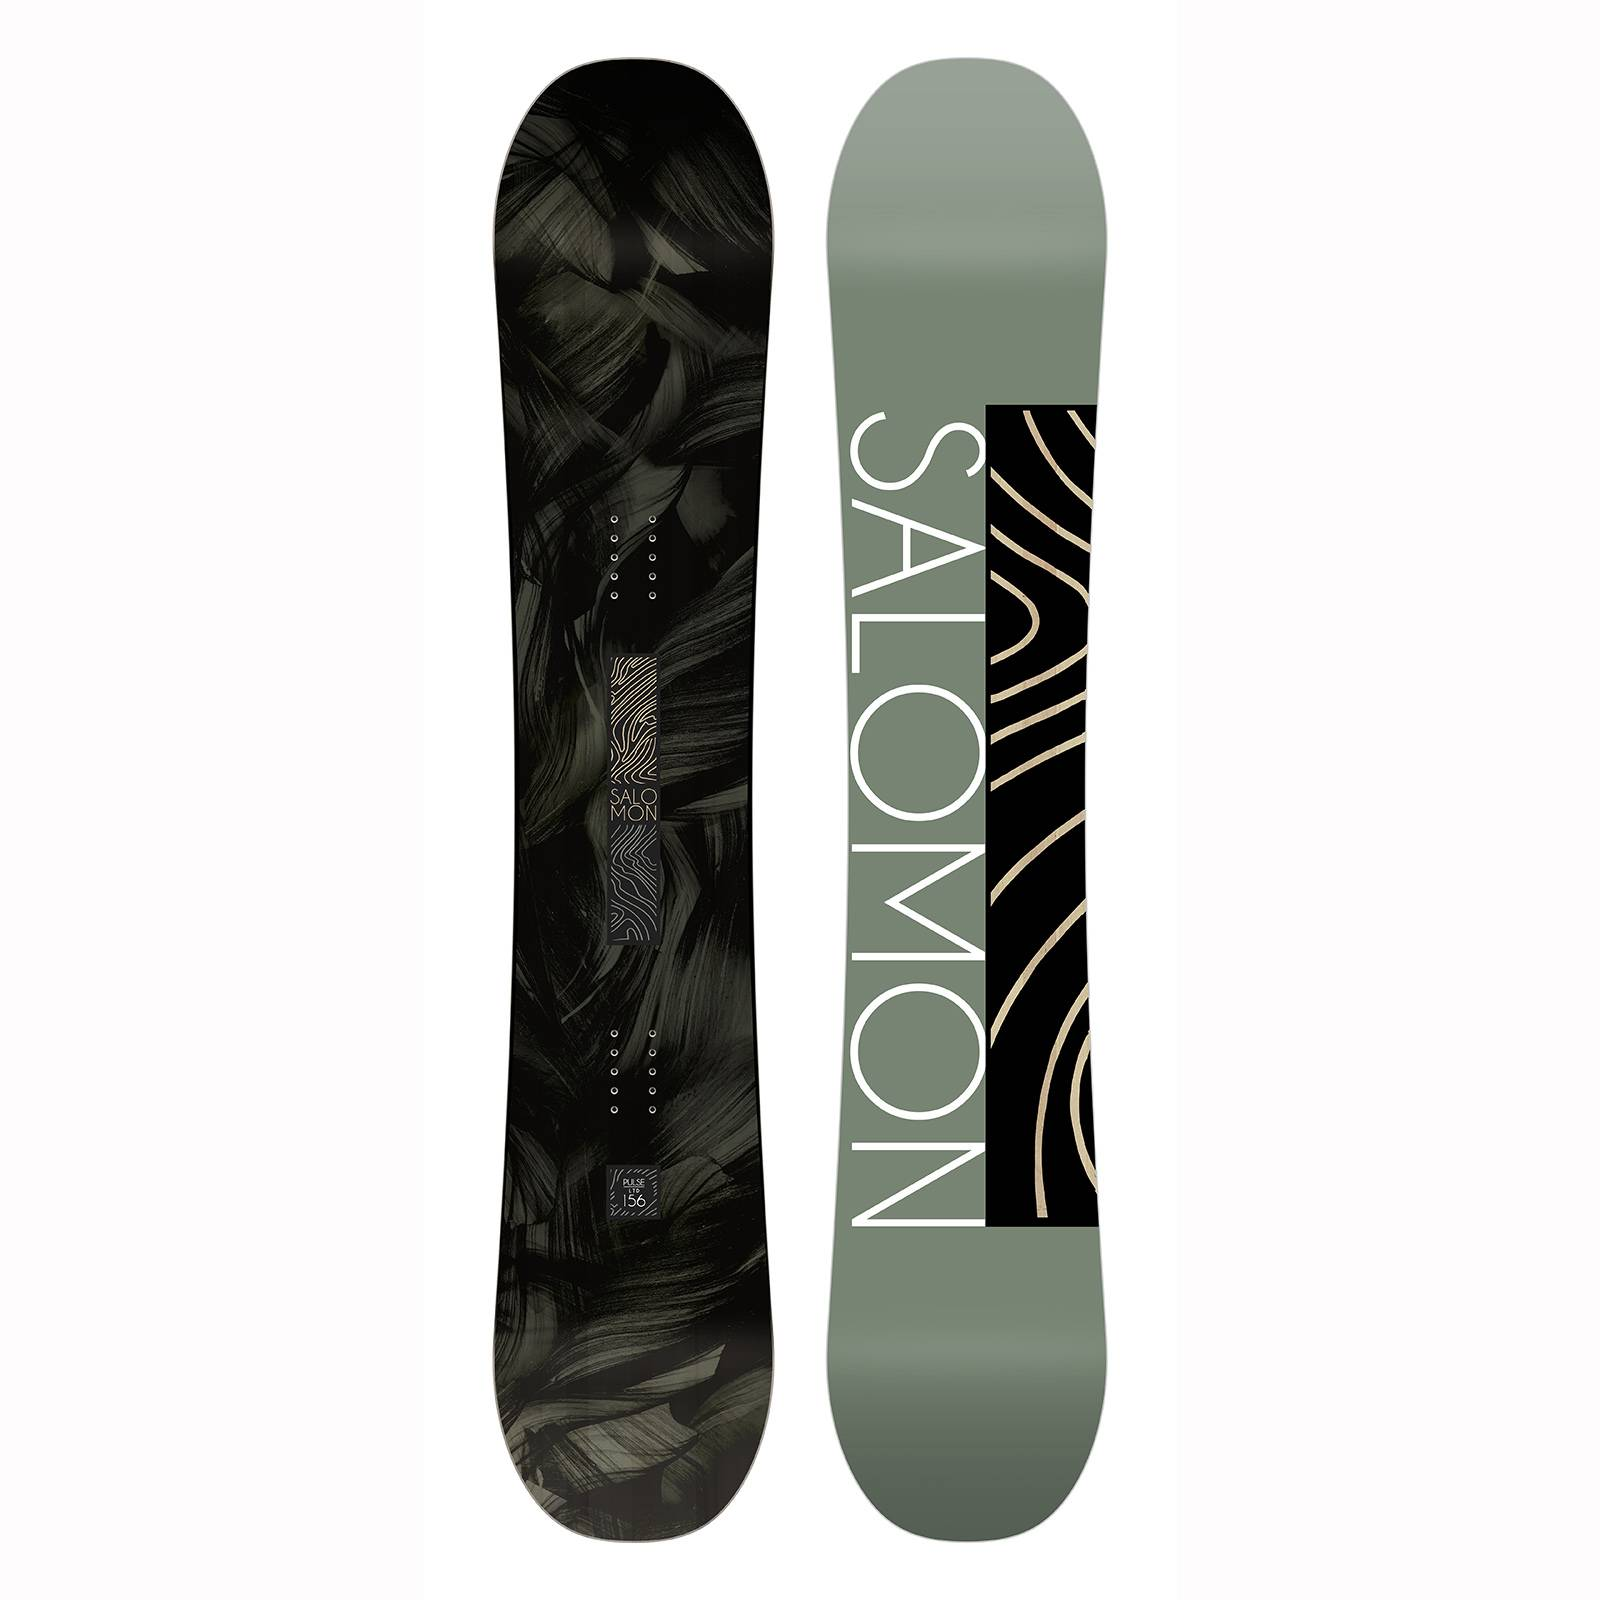 salomon Pack De Snowboard Salomon Pulse Ltd+rhythm Oil Green Homme